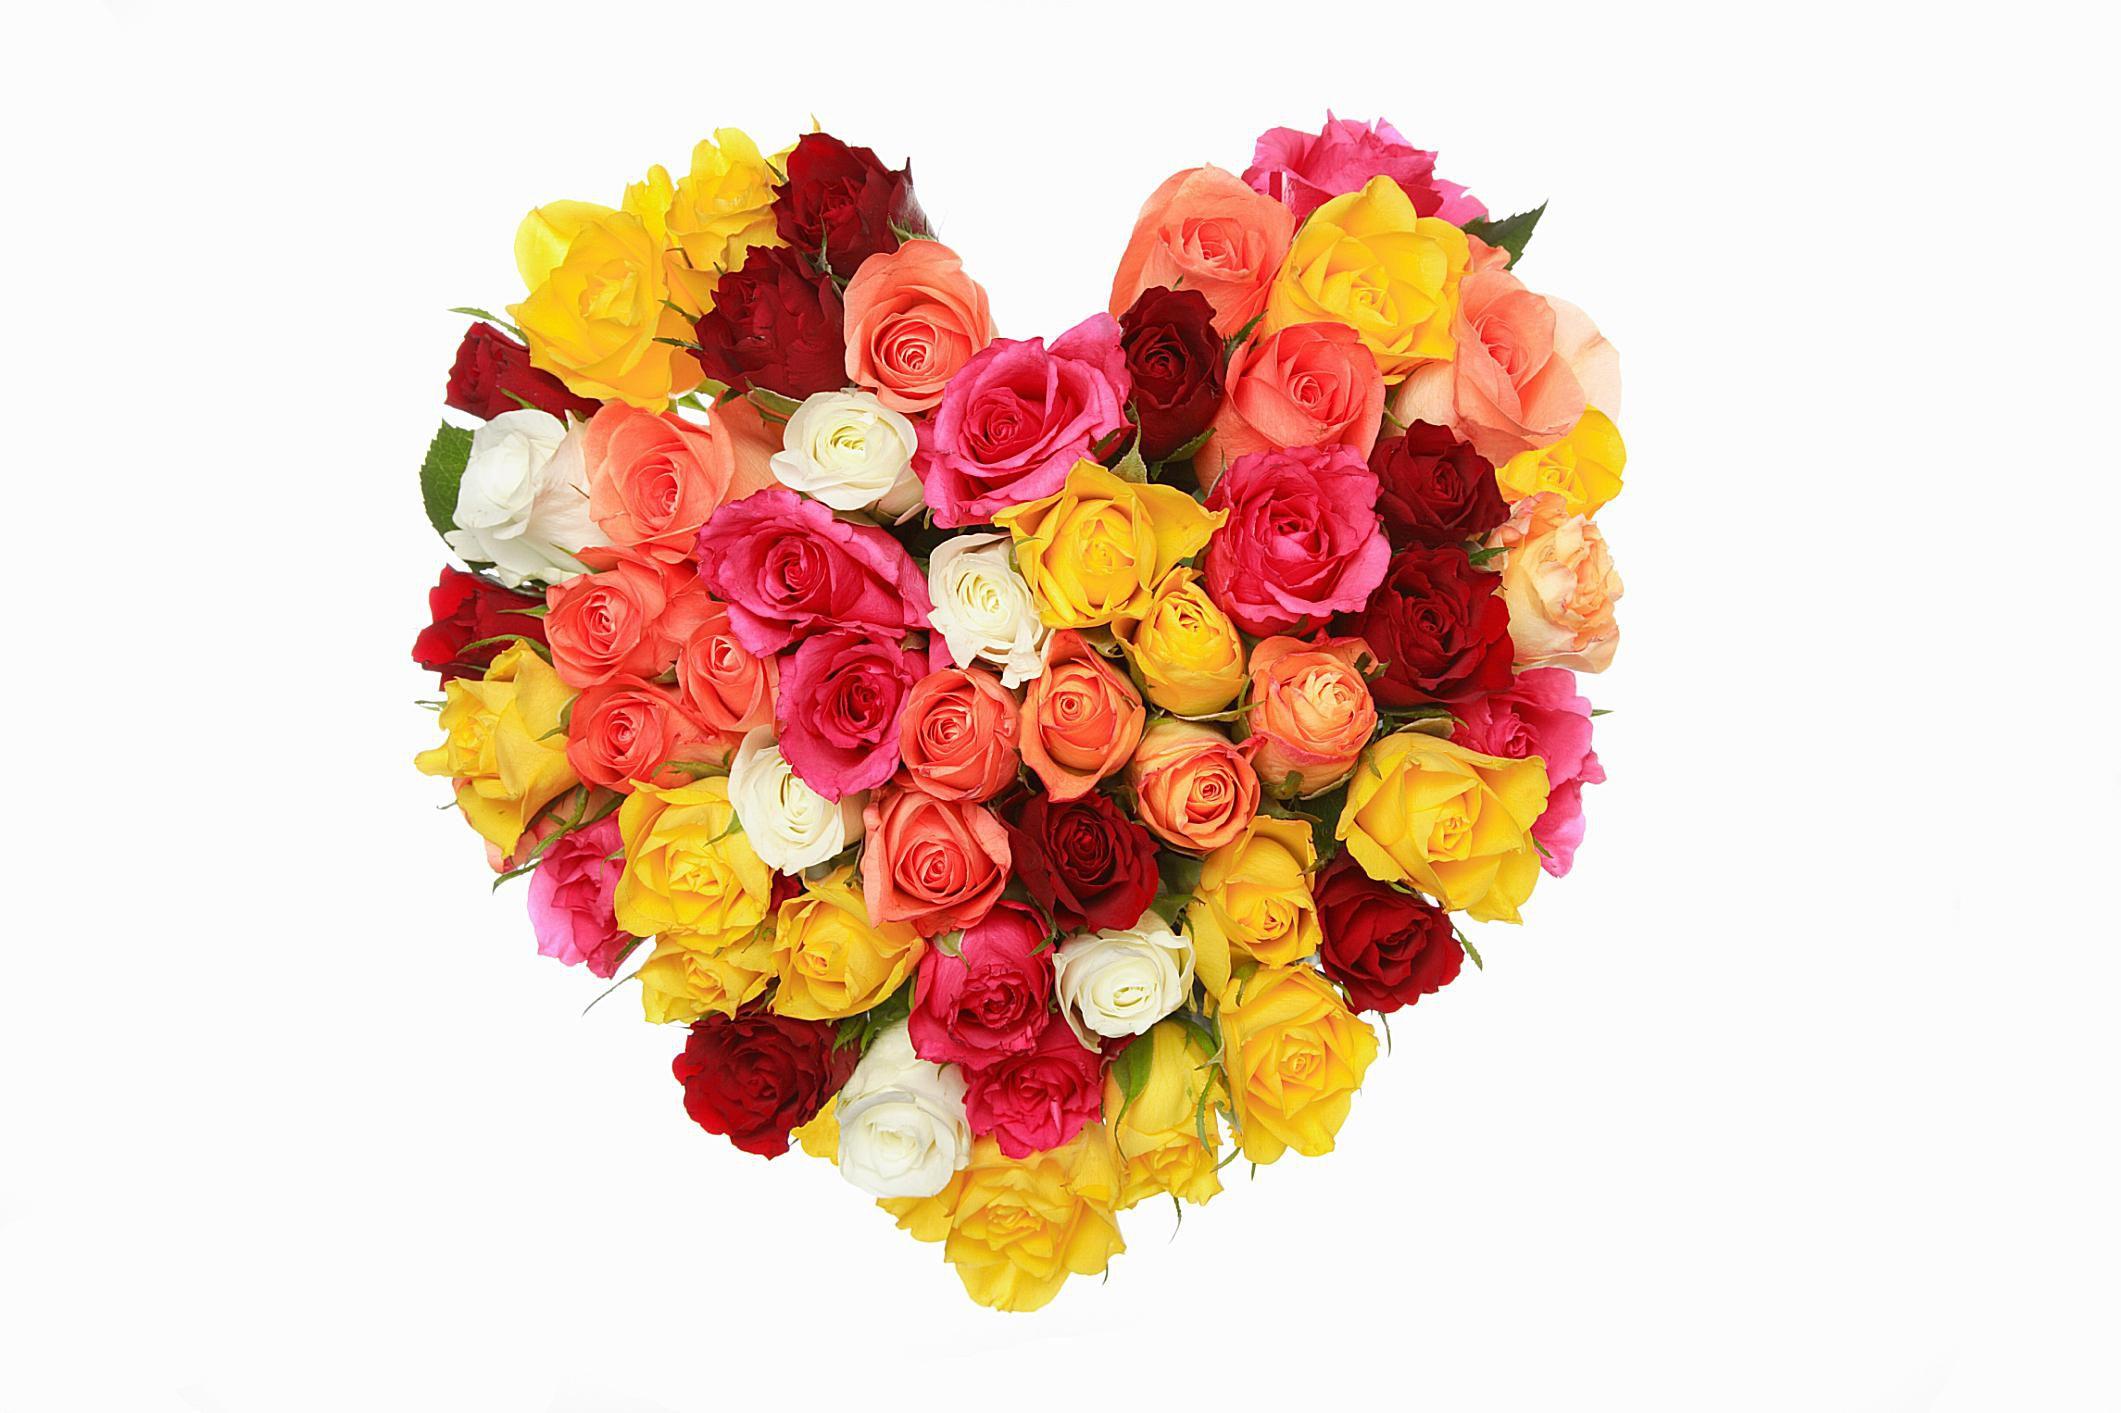 Sacred Roses The Spiritual Symbolism Of Roses